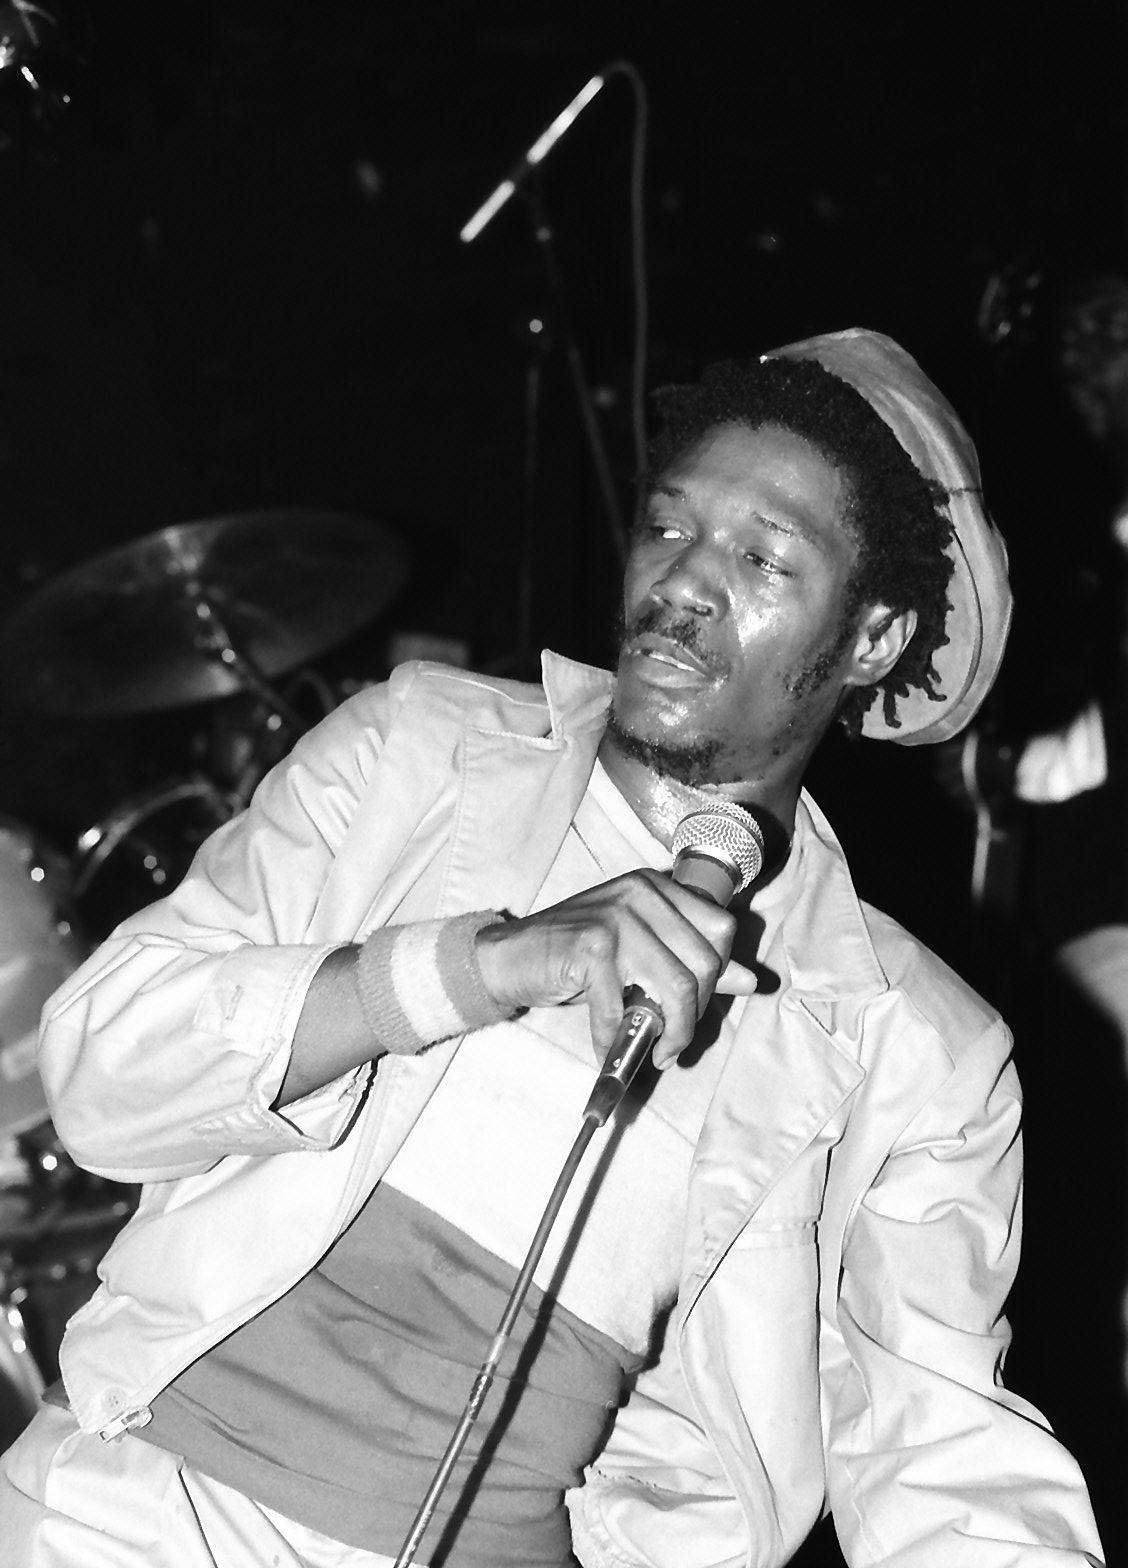 Horace Andy, Jamaican Reggae Singer-Songwriter 1951